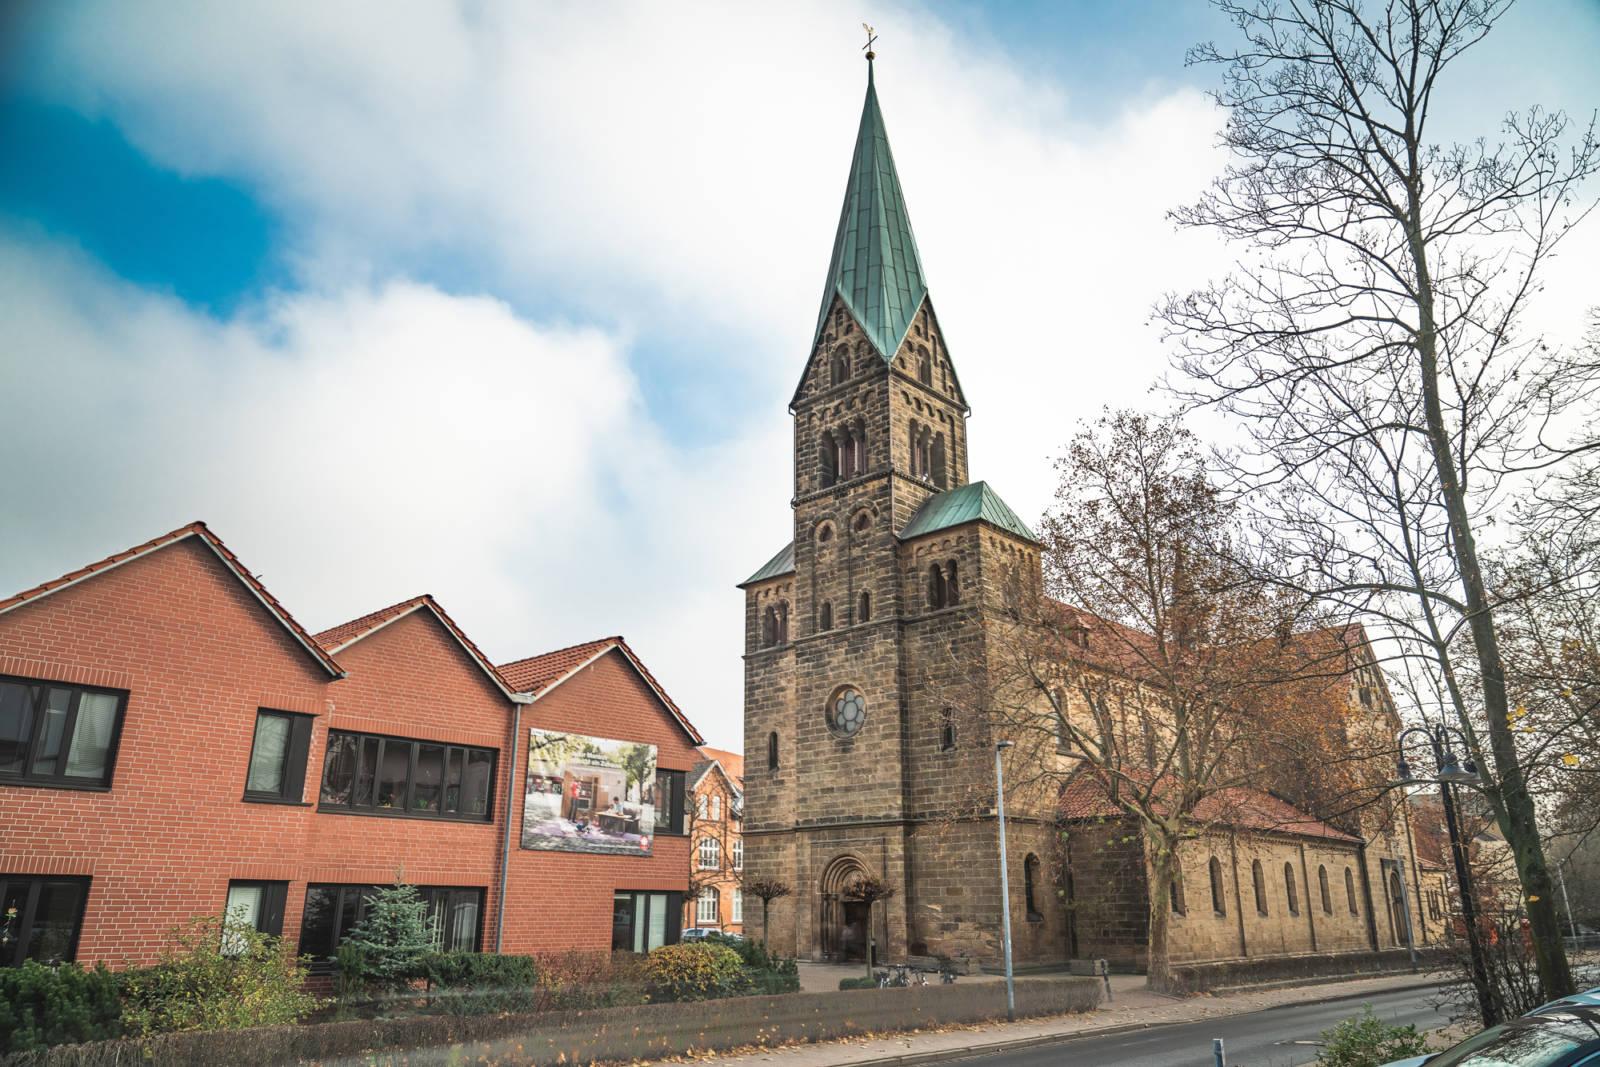 Angebote - Kath. Pfarrei St. Petrus Wolfenbüttel